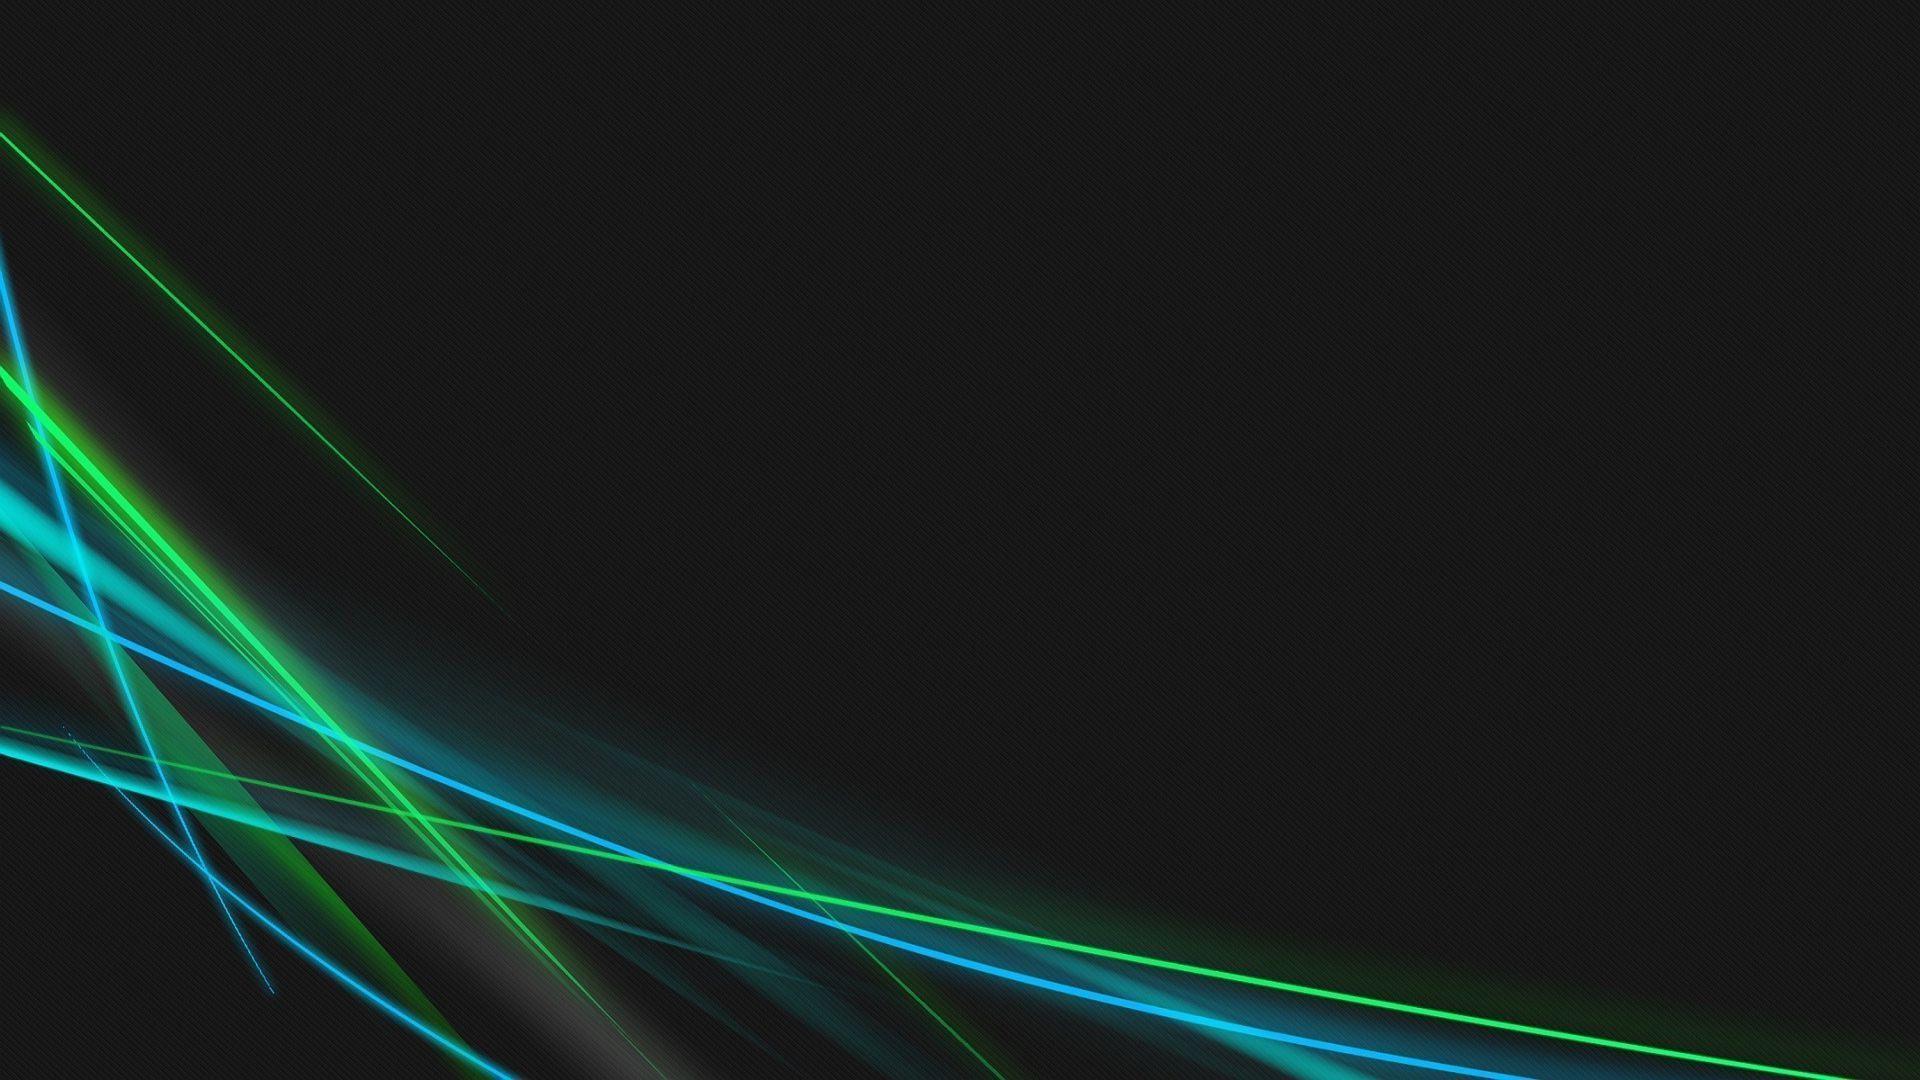 30+ Neon Desktop Backgrounds, Images, Pictures, Wallpapers ...  |Black Neon Background